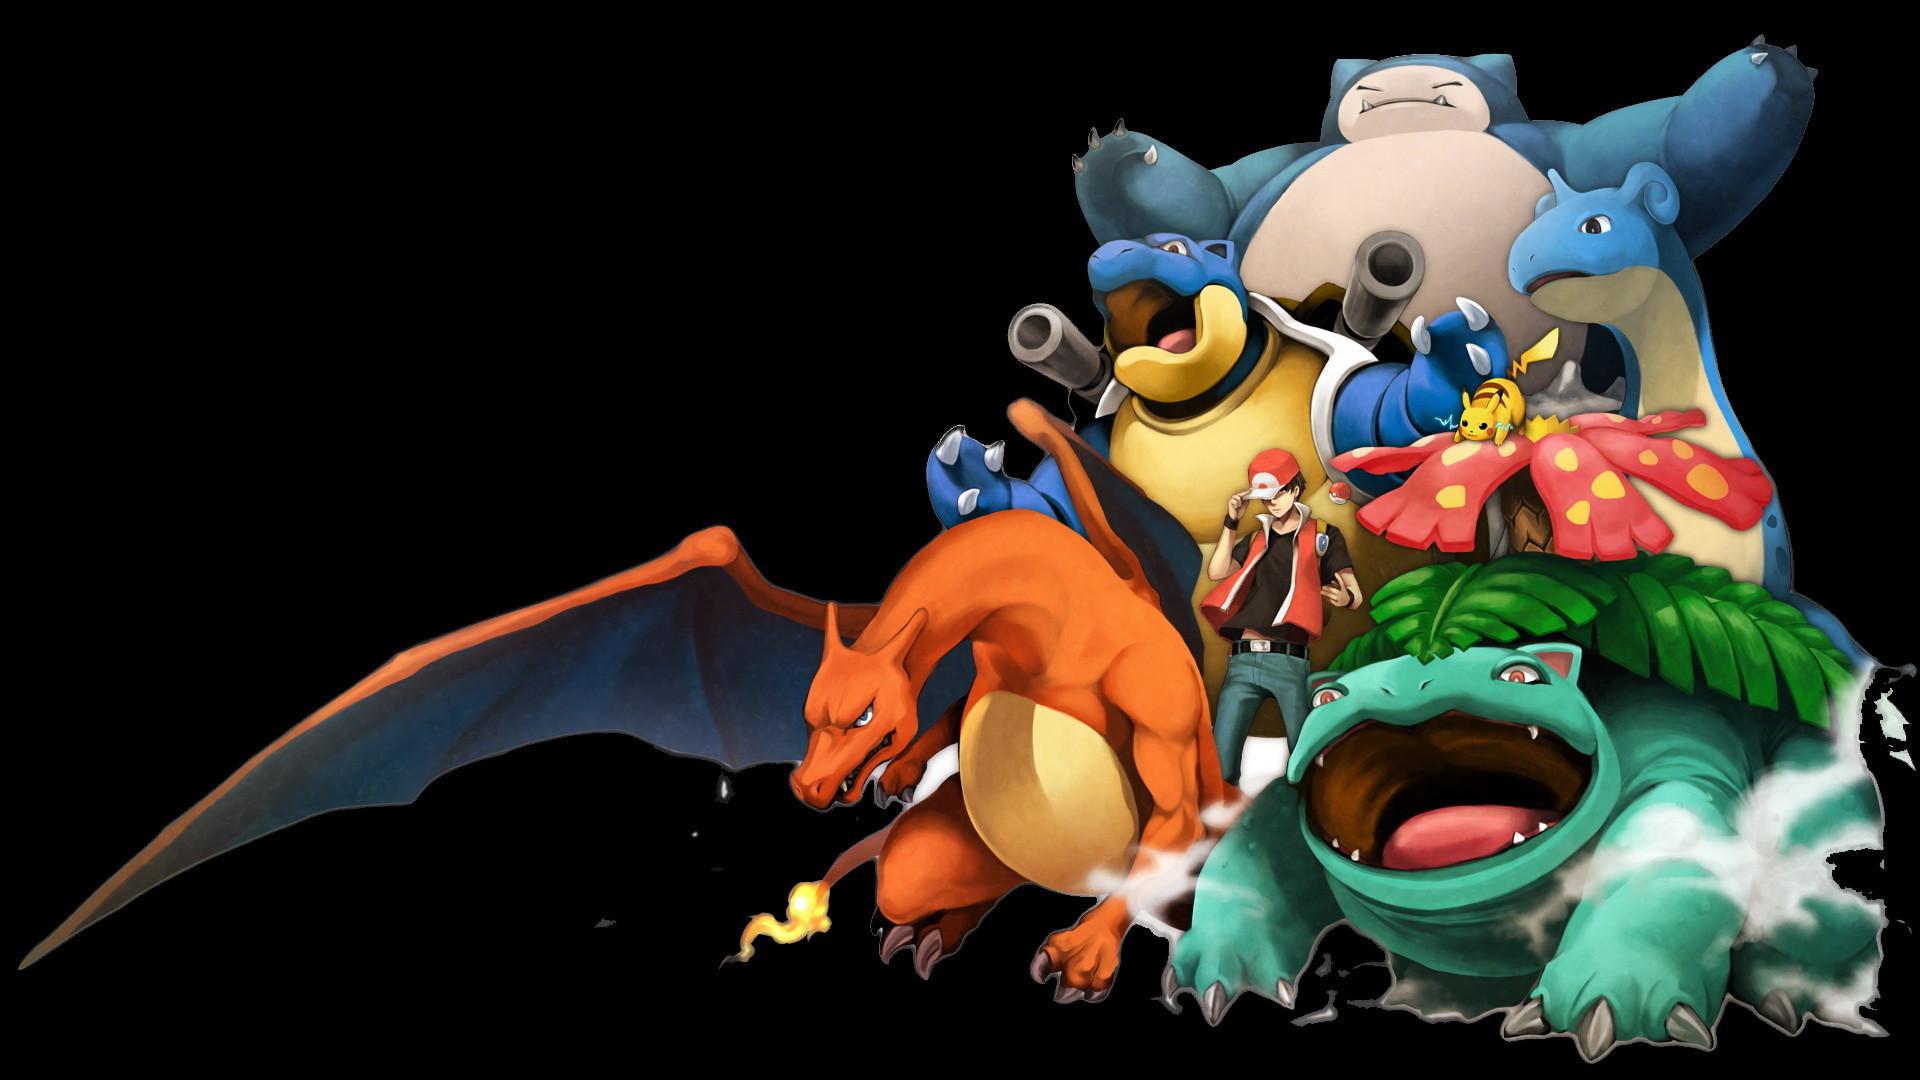 Pokemon,wallpaper,arkeis-pokemon,sandbox,chespin,fennekin,froakie | pokemon  | Pinterest | Sandbox, Pokémon and Pokemon pictures